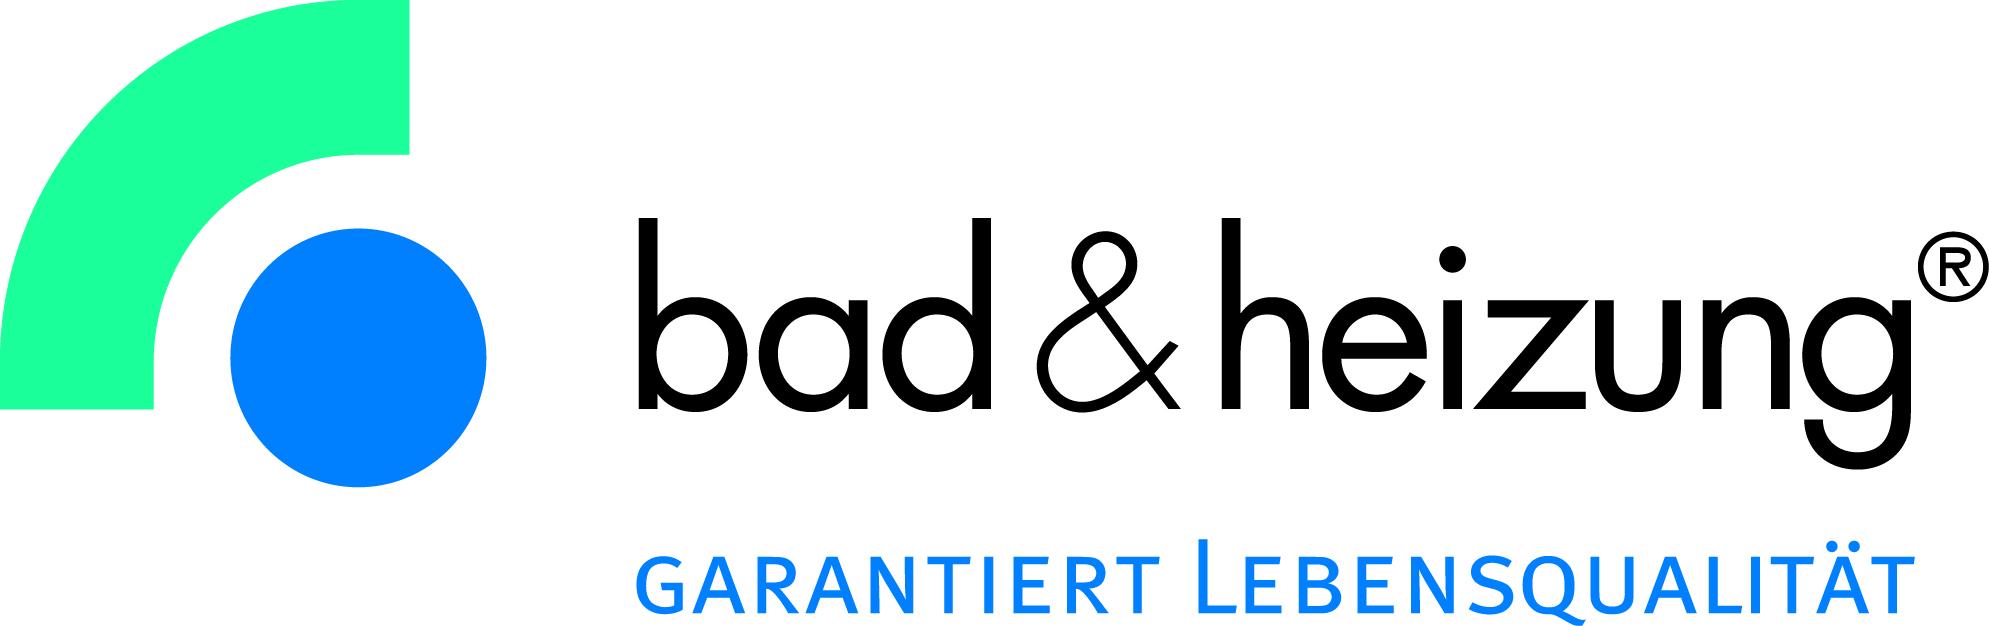 bad&heizung Logo_CMYK